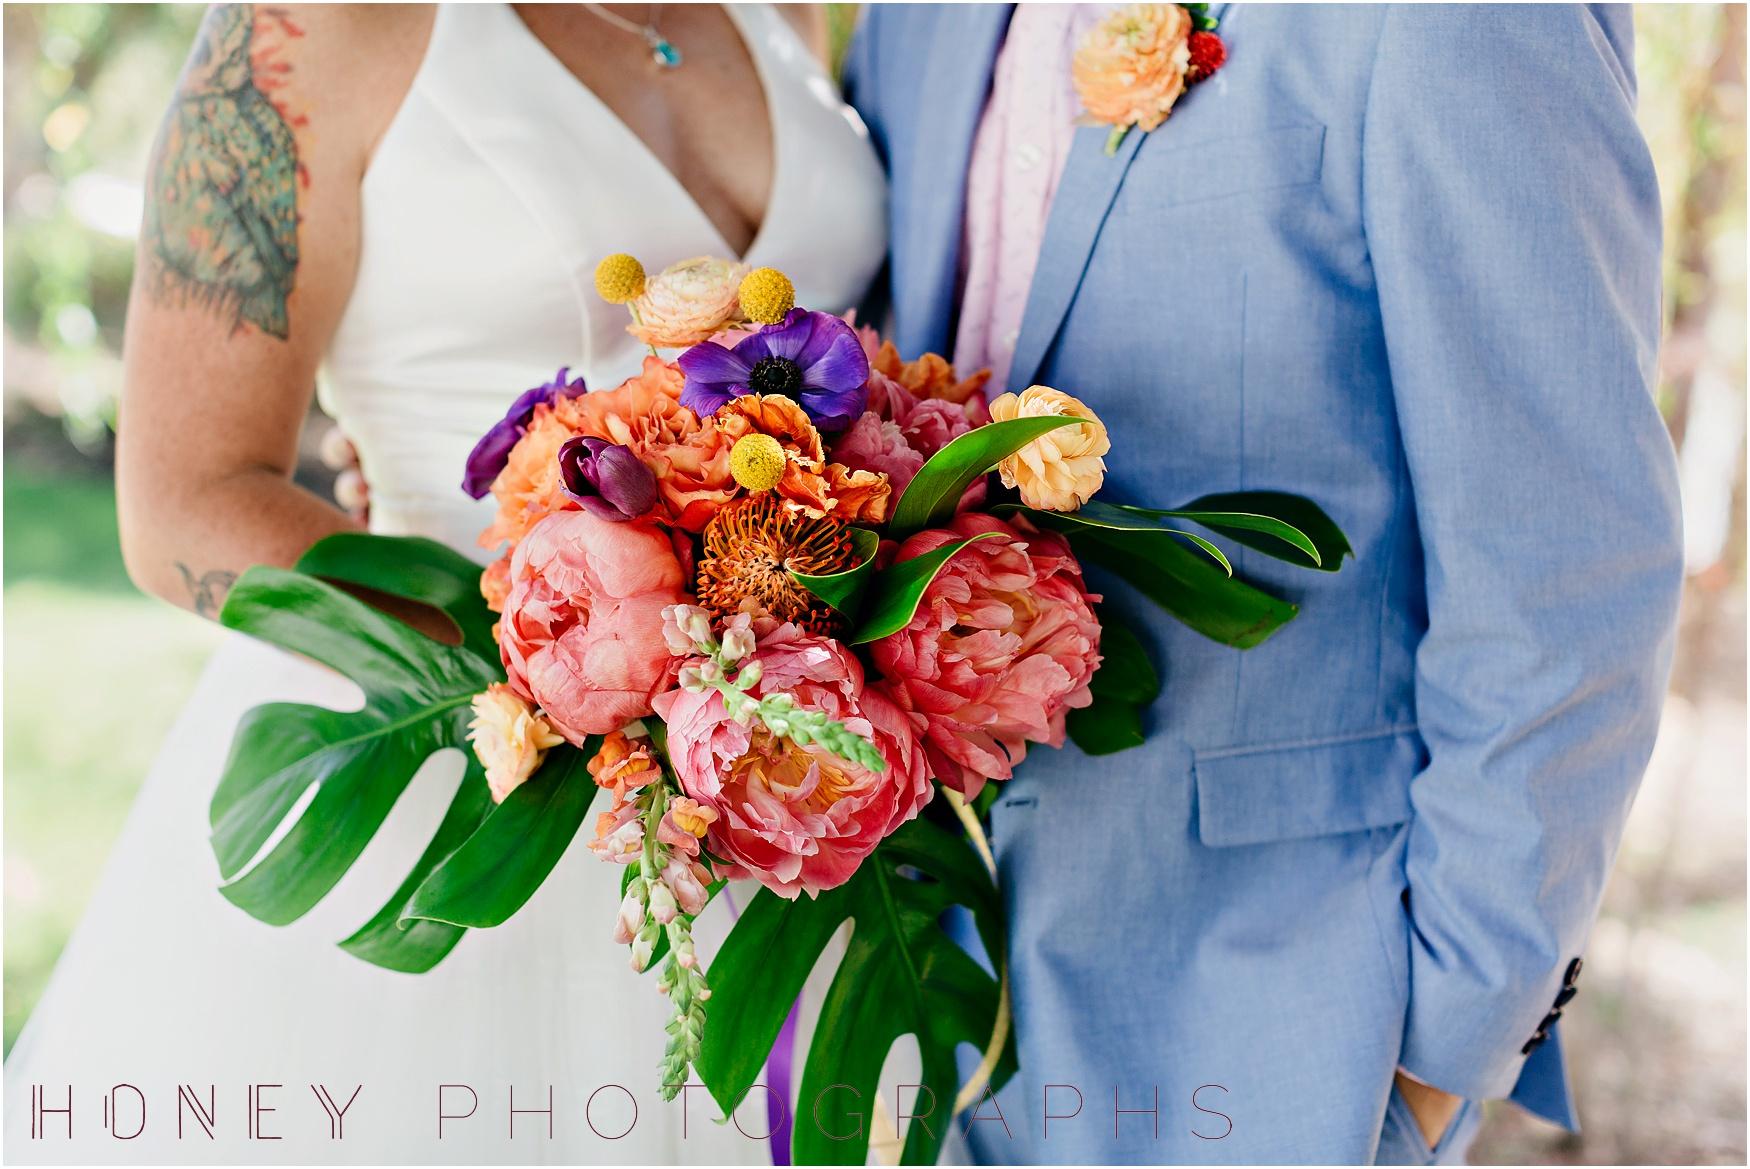 colorful_ecclectic_vibrant_vista_rainbow_quirky_wedding035.jpg